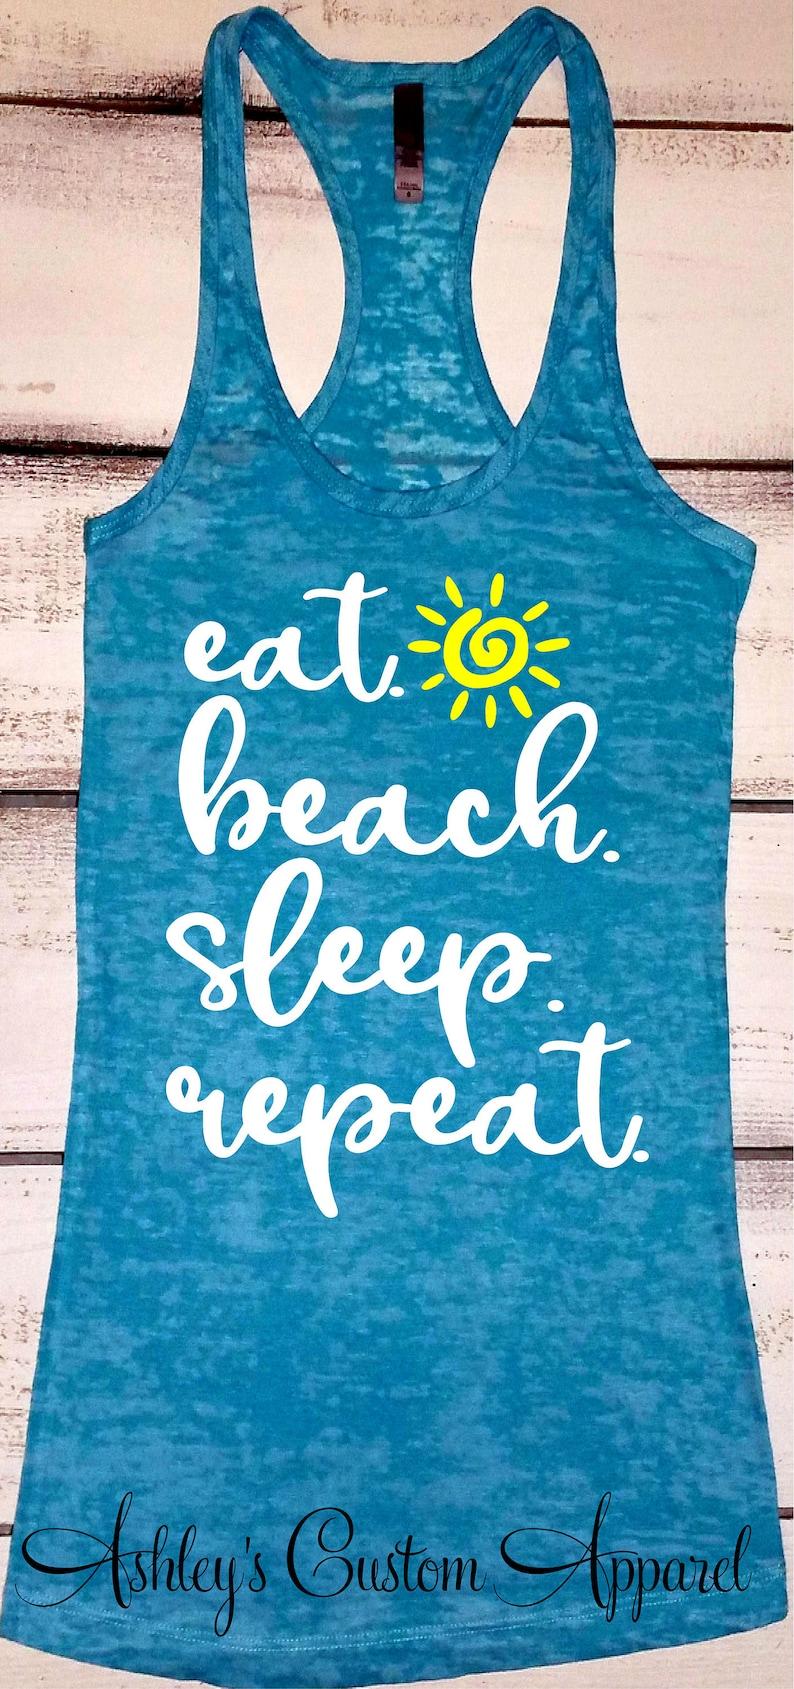 46b93c95d0 Beach Tank Tops Beach Vacation Shirts Eat Beach Sleep Repeat | Etsy